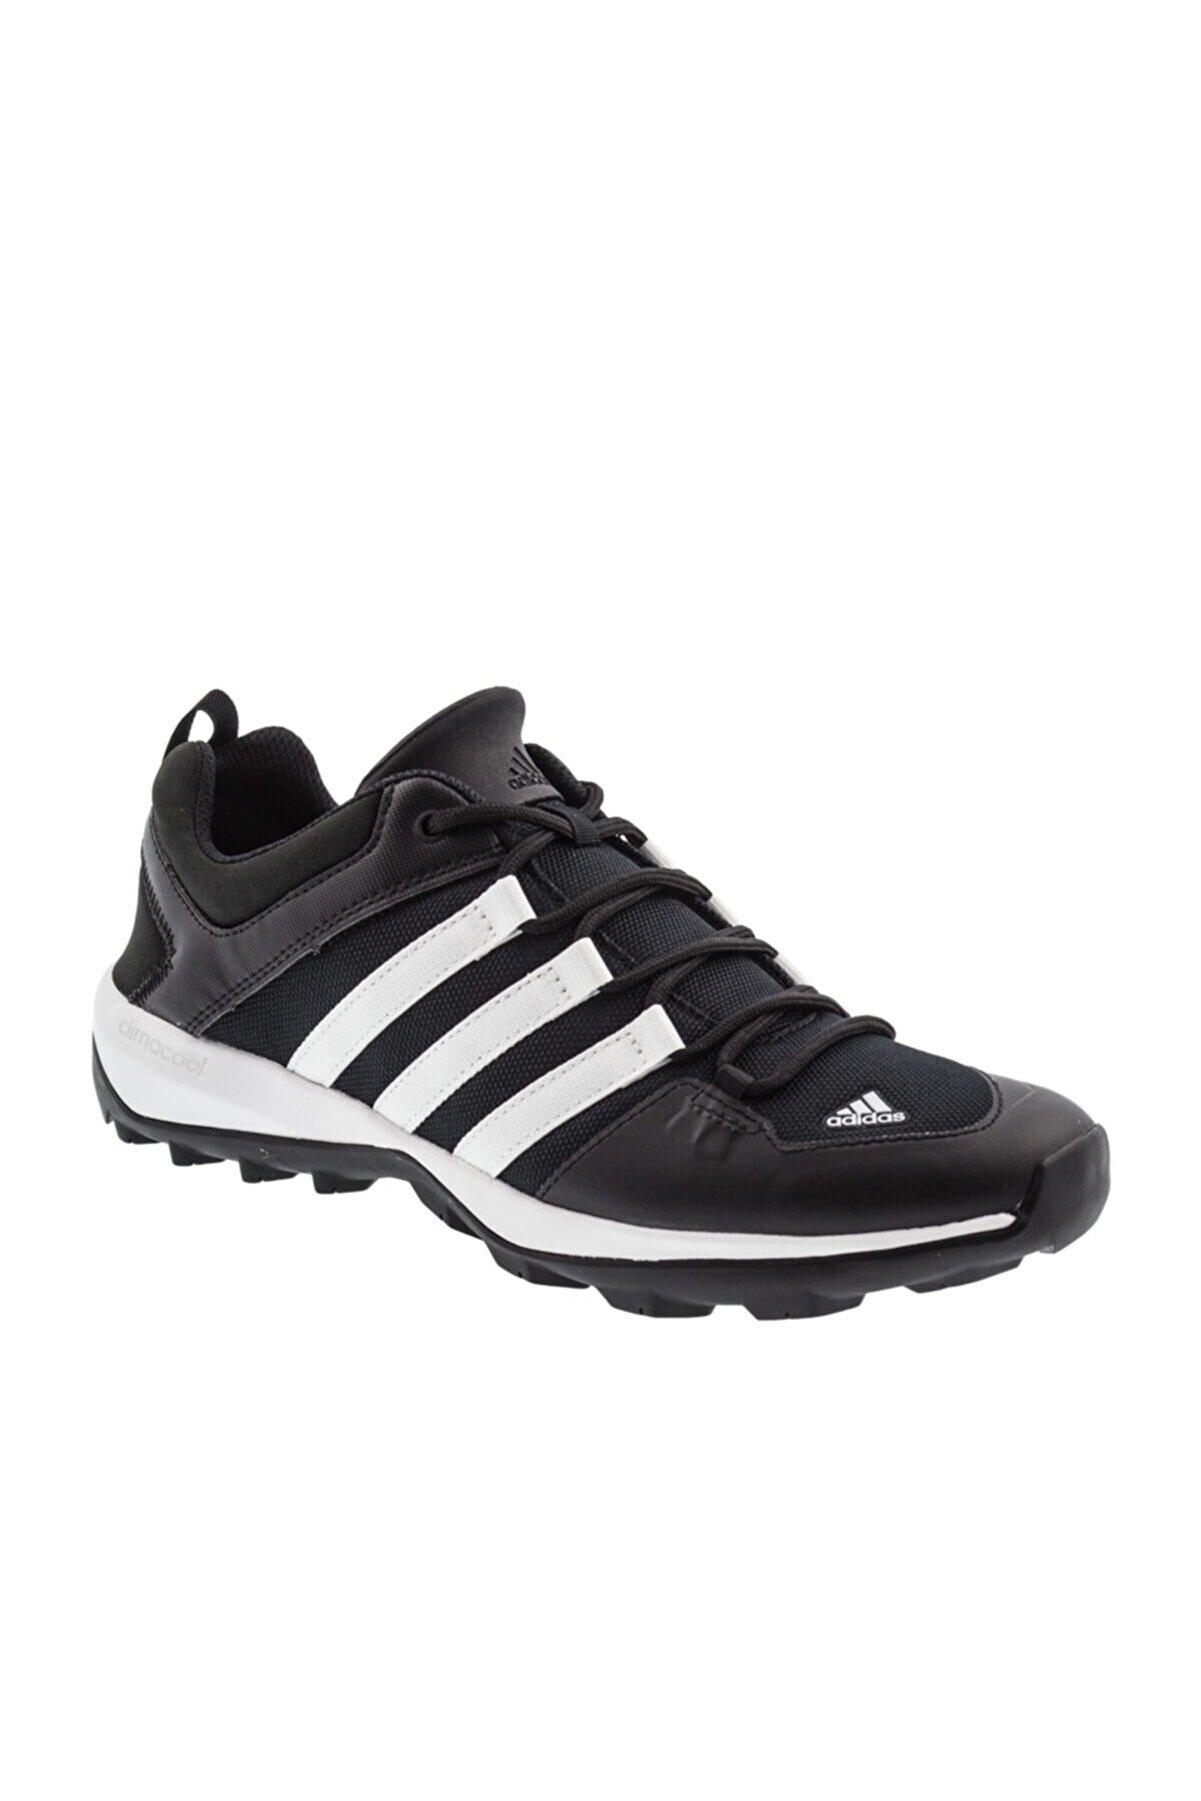 adidas Climacool Daroga Plus Canvas Siyah Outdoor Ayakkabı (B44328)